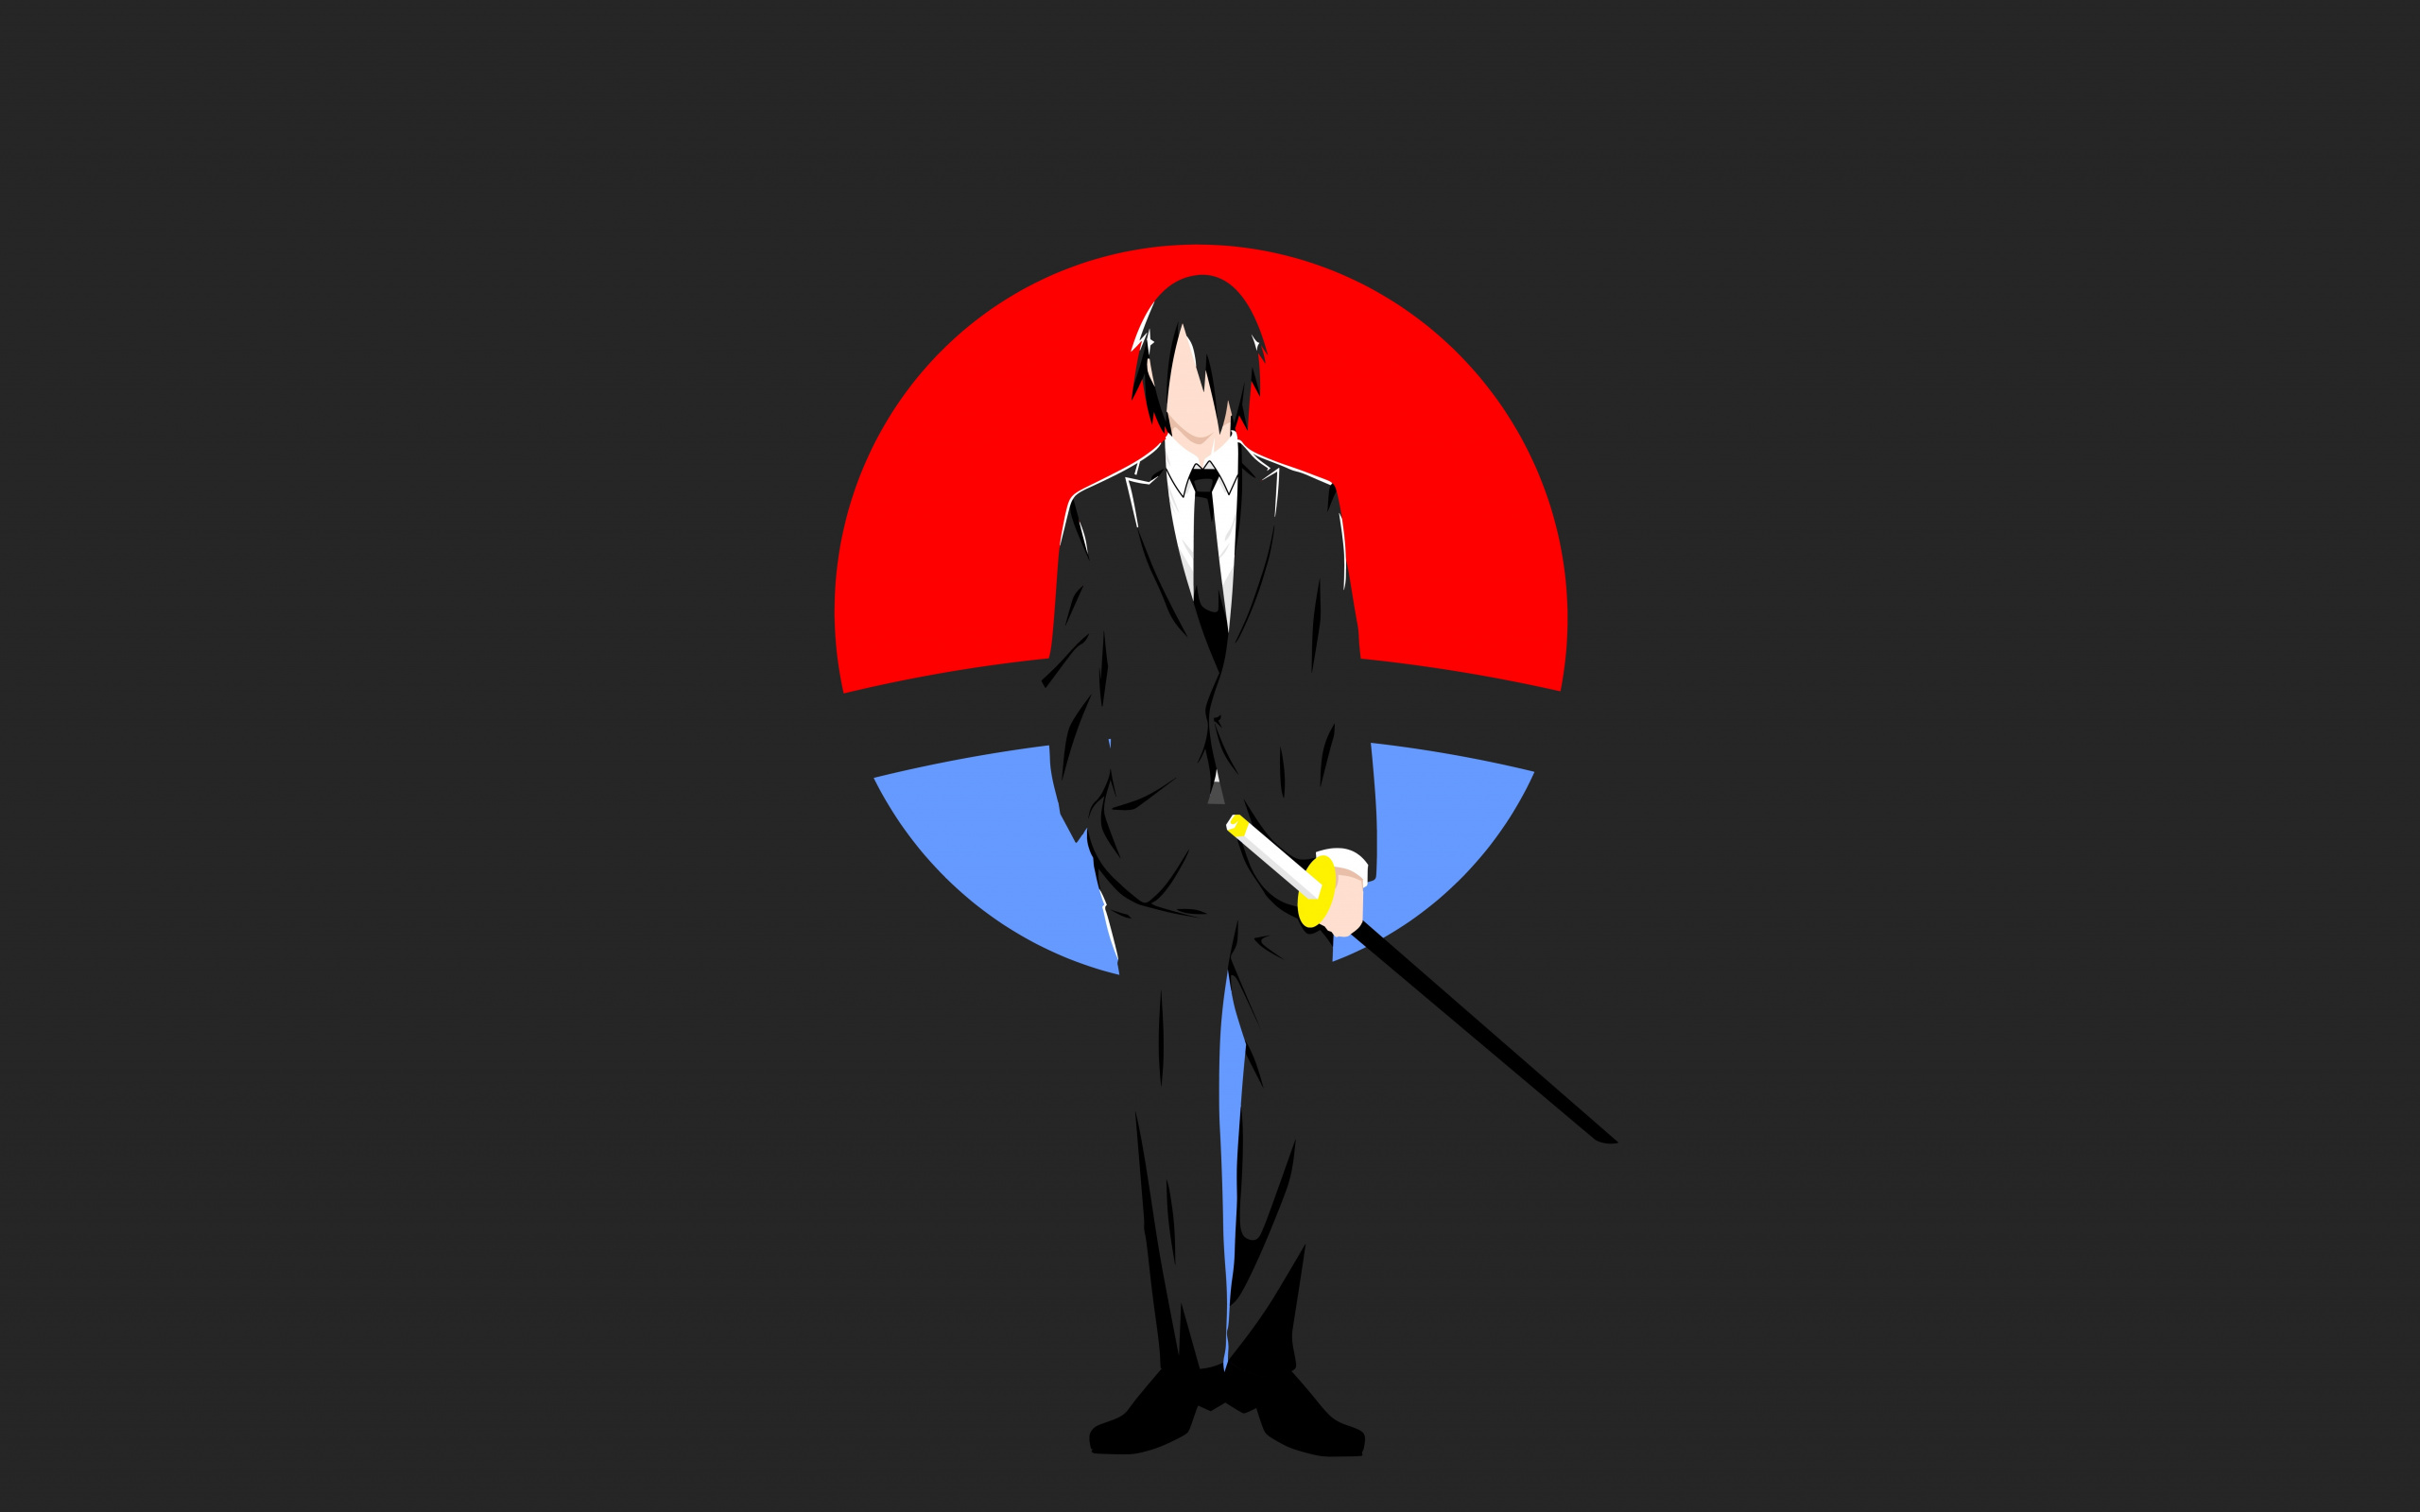 Minimal, Sasuke Uchiha, Naruto, Anime, Wallpaper - Ultra Hd Sasuke Uchiha - HD Wallpaper